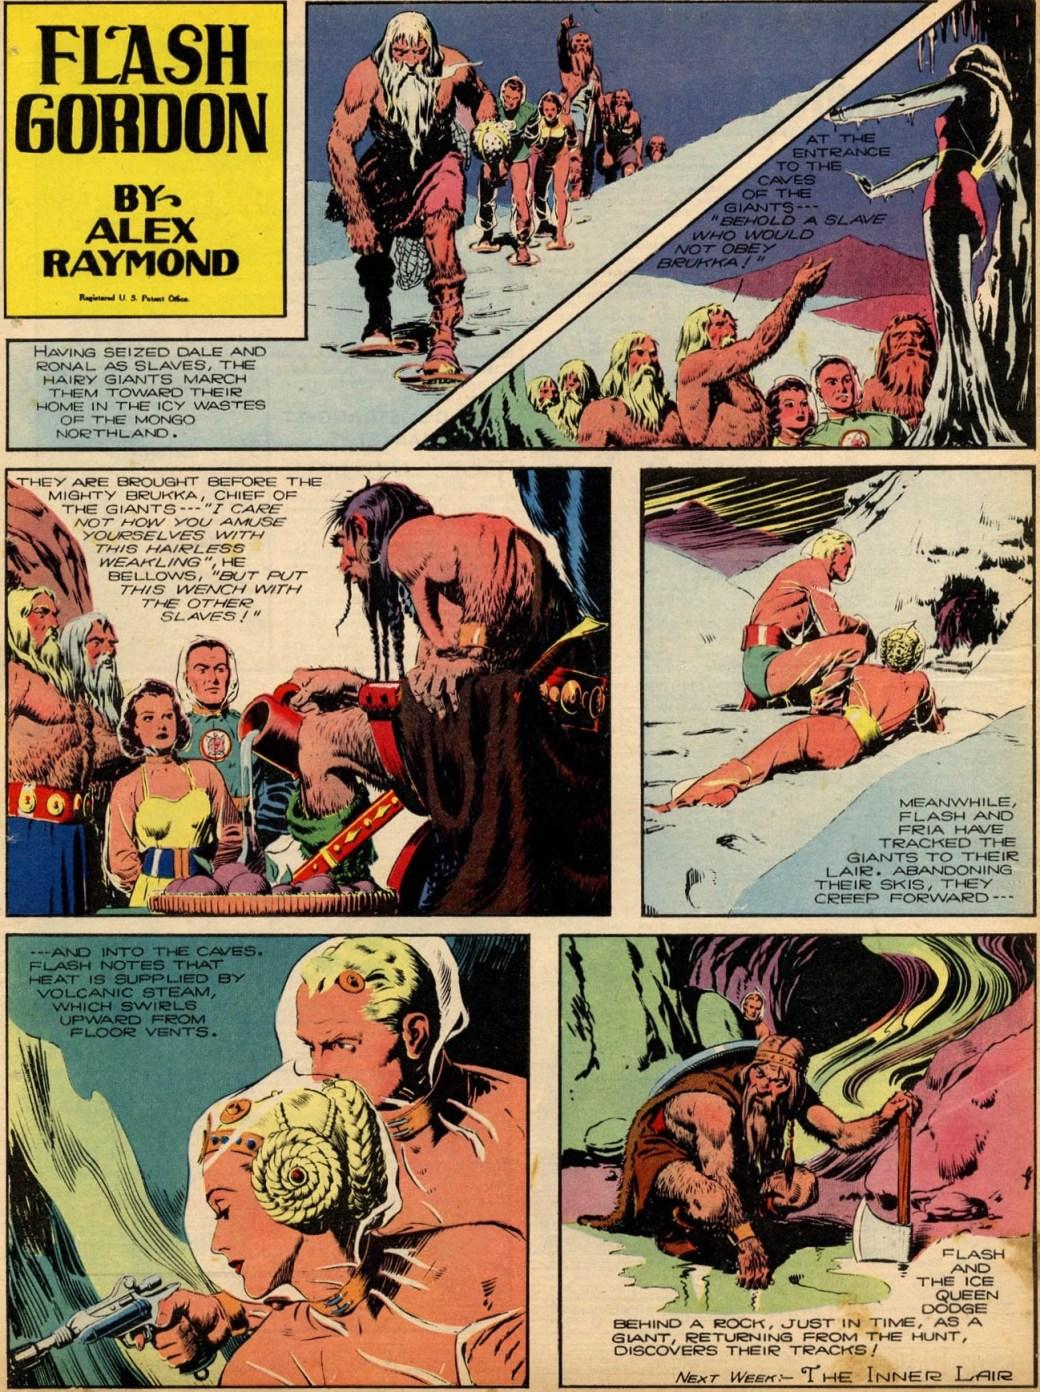 Flash Gordon av Alex Raymond från 28 maj 1939